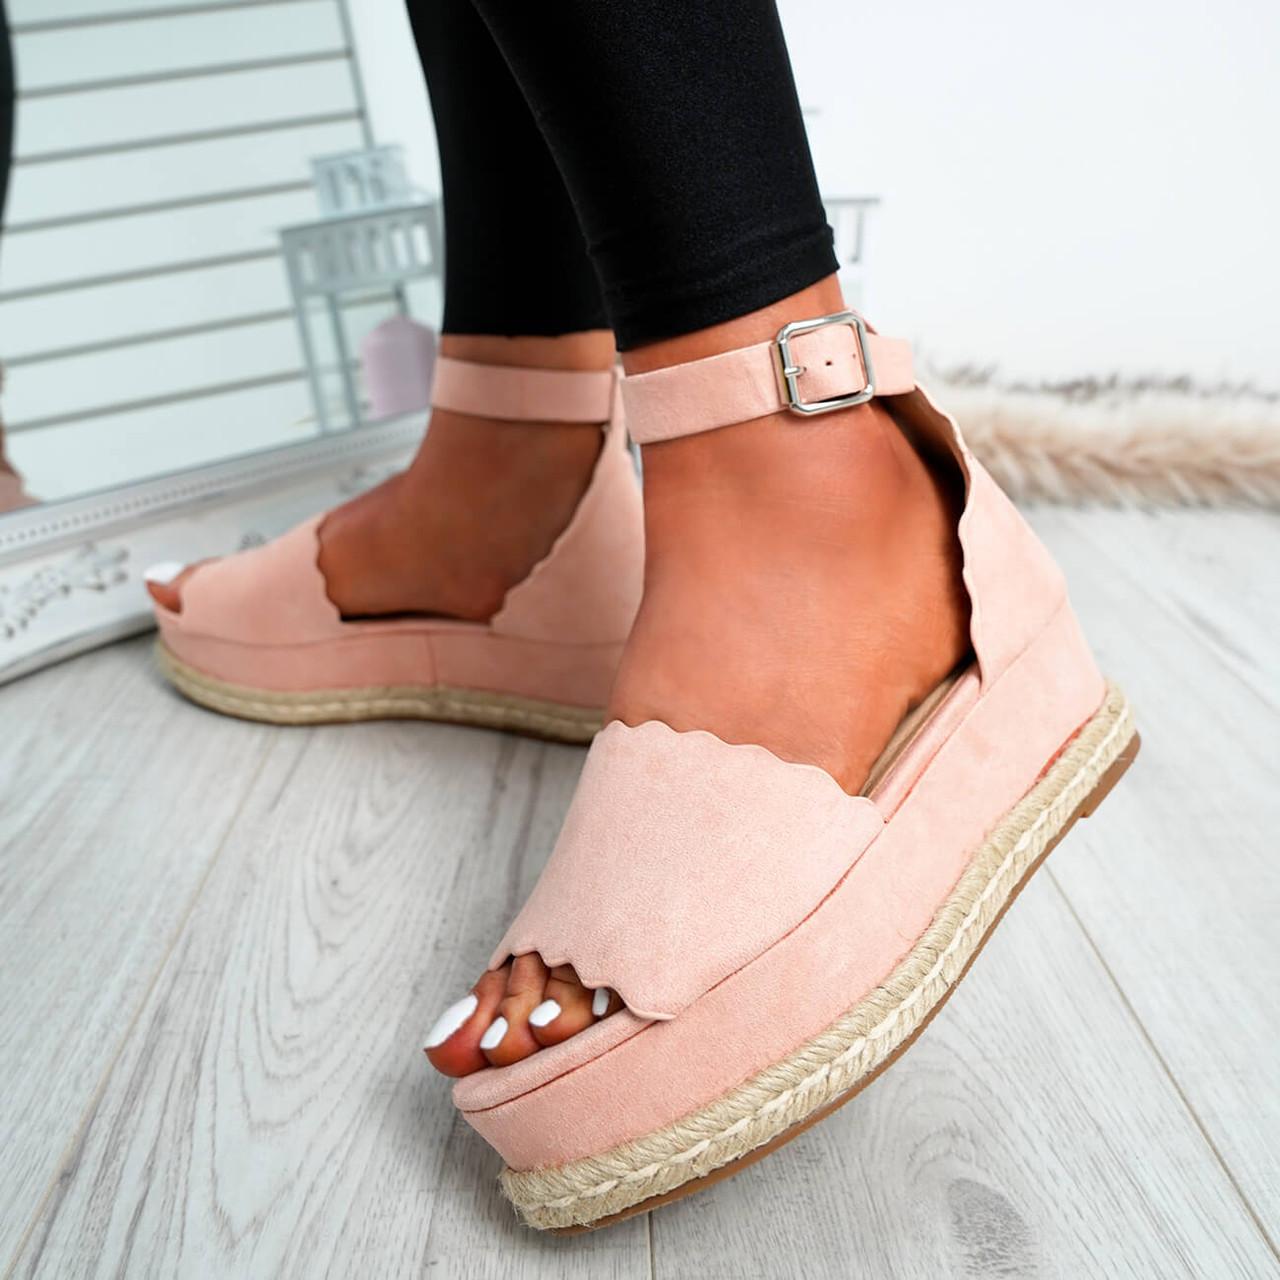 eee15b32d0e Womens Ladies Espadrille Wedge Platform Sandals Ankle Strap Casual ...